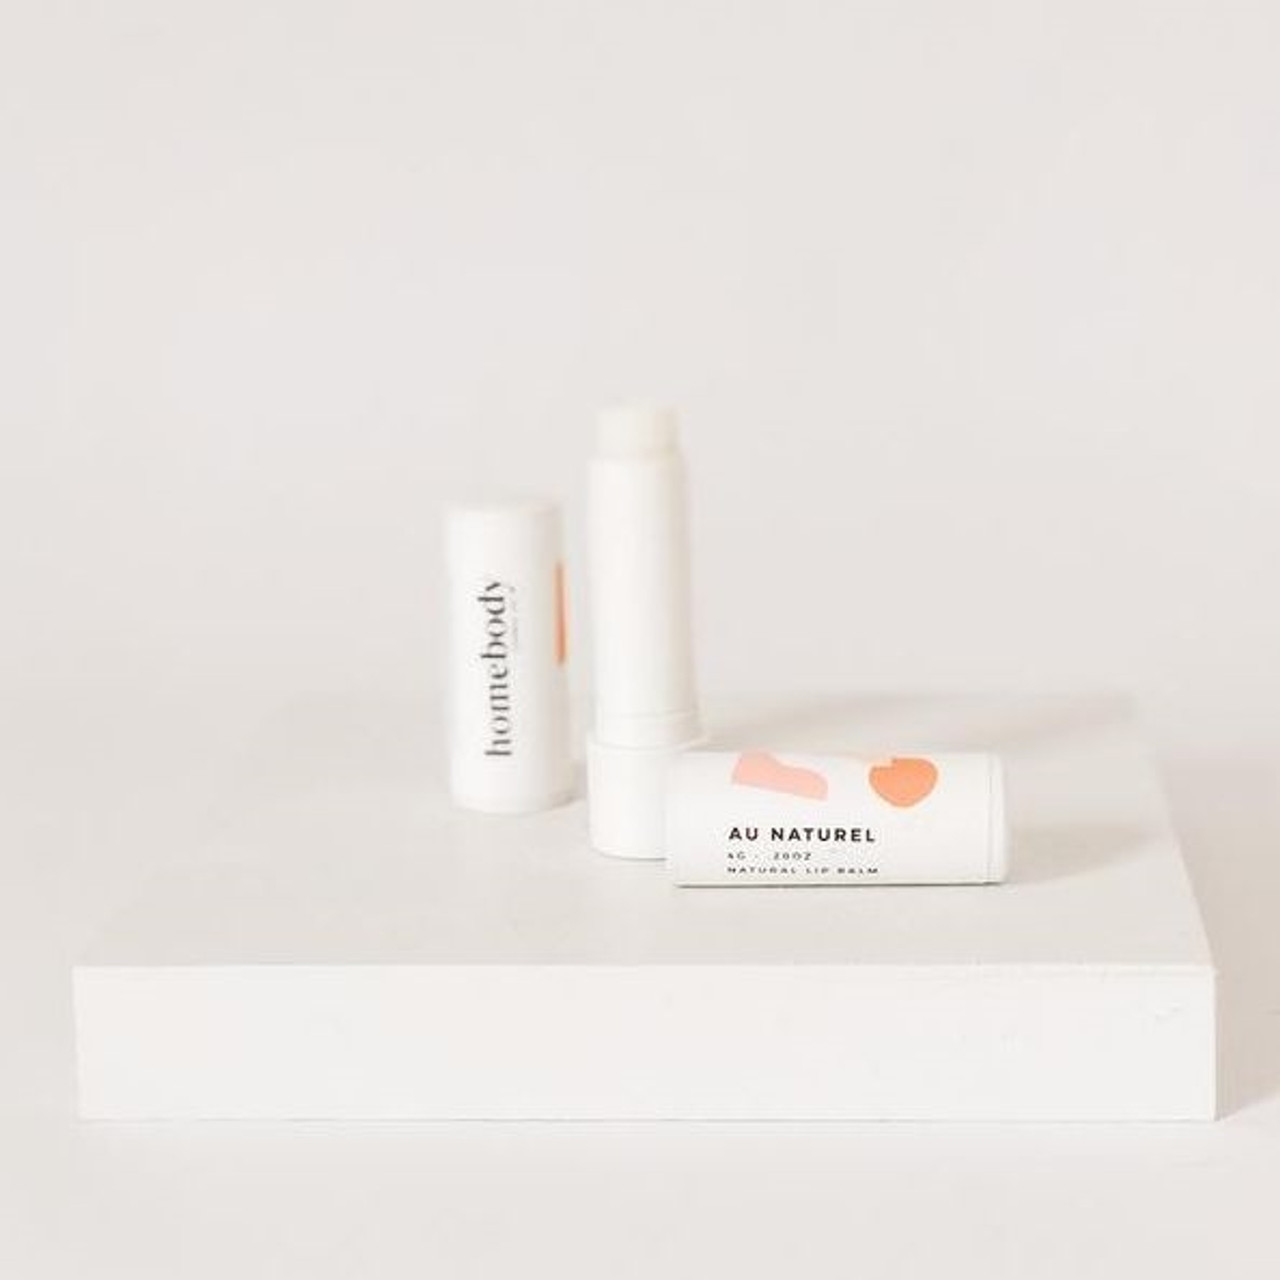 Organic Lip Balm - Au Natural, Unscented